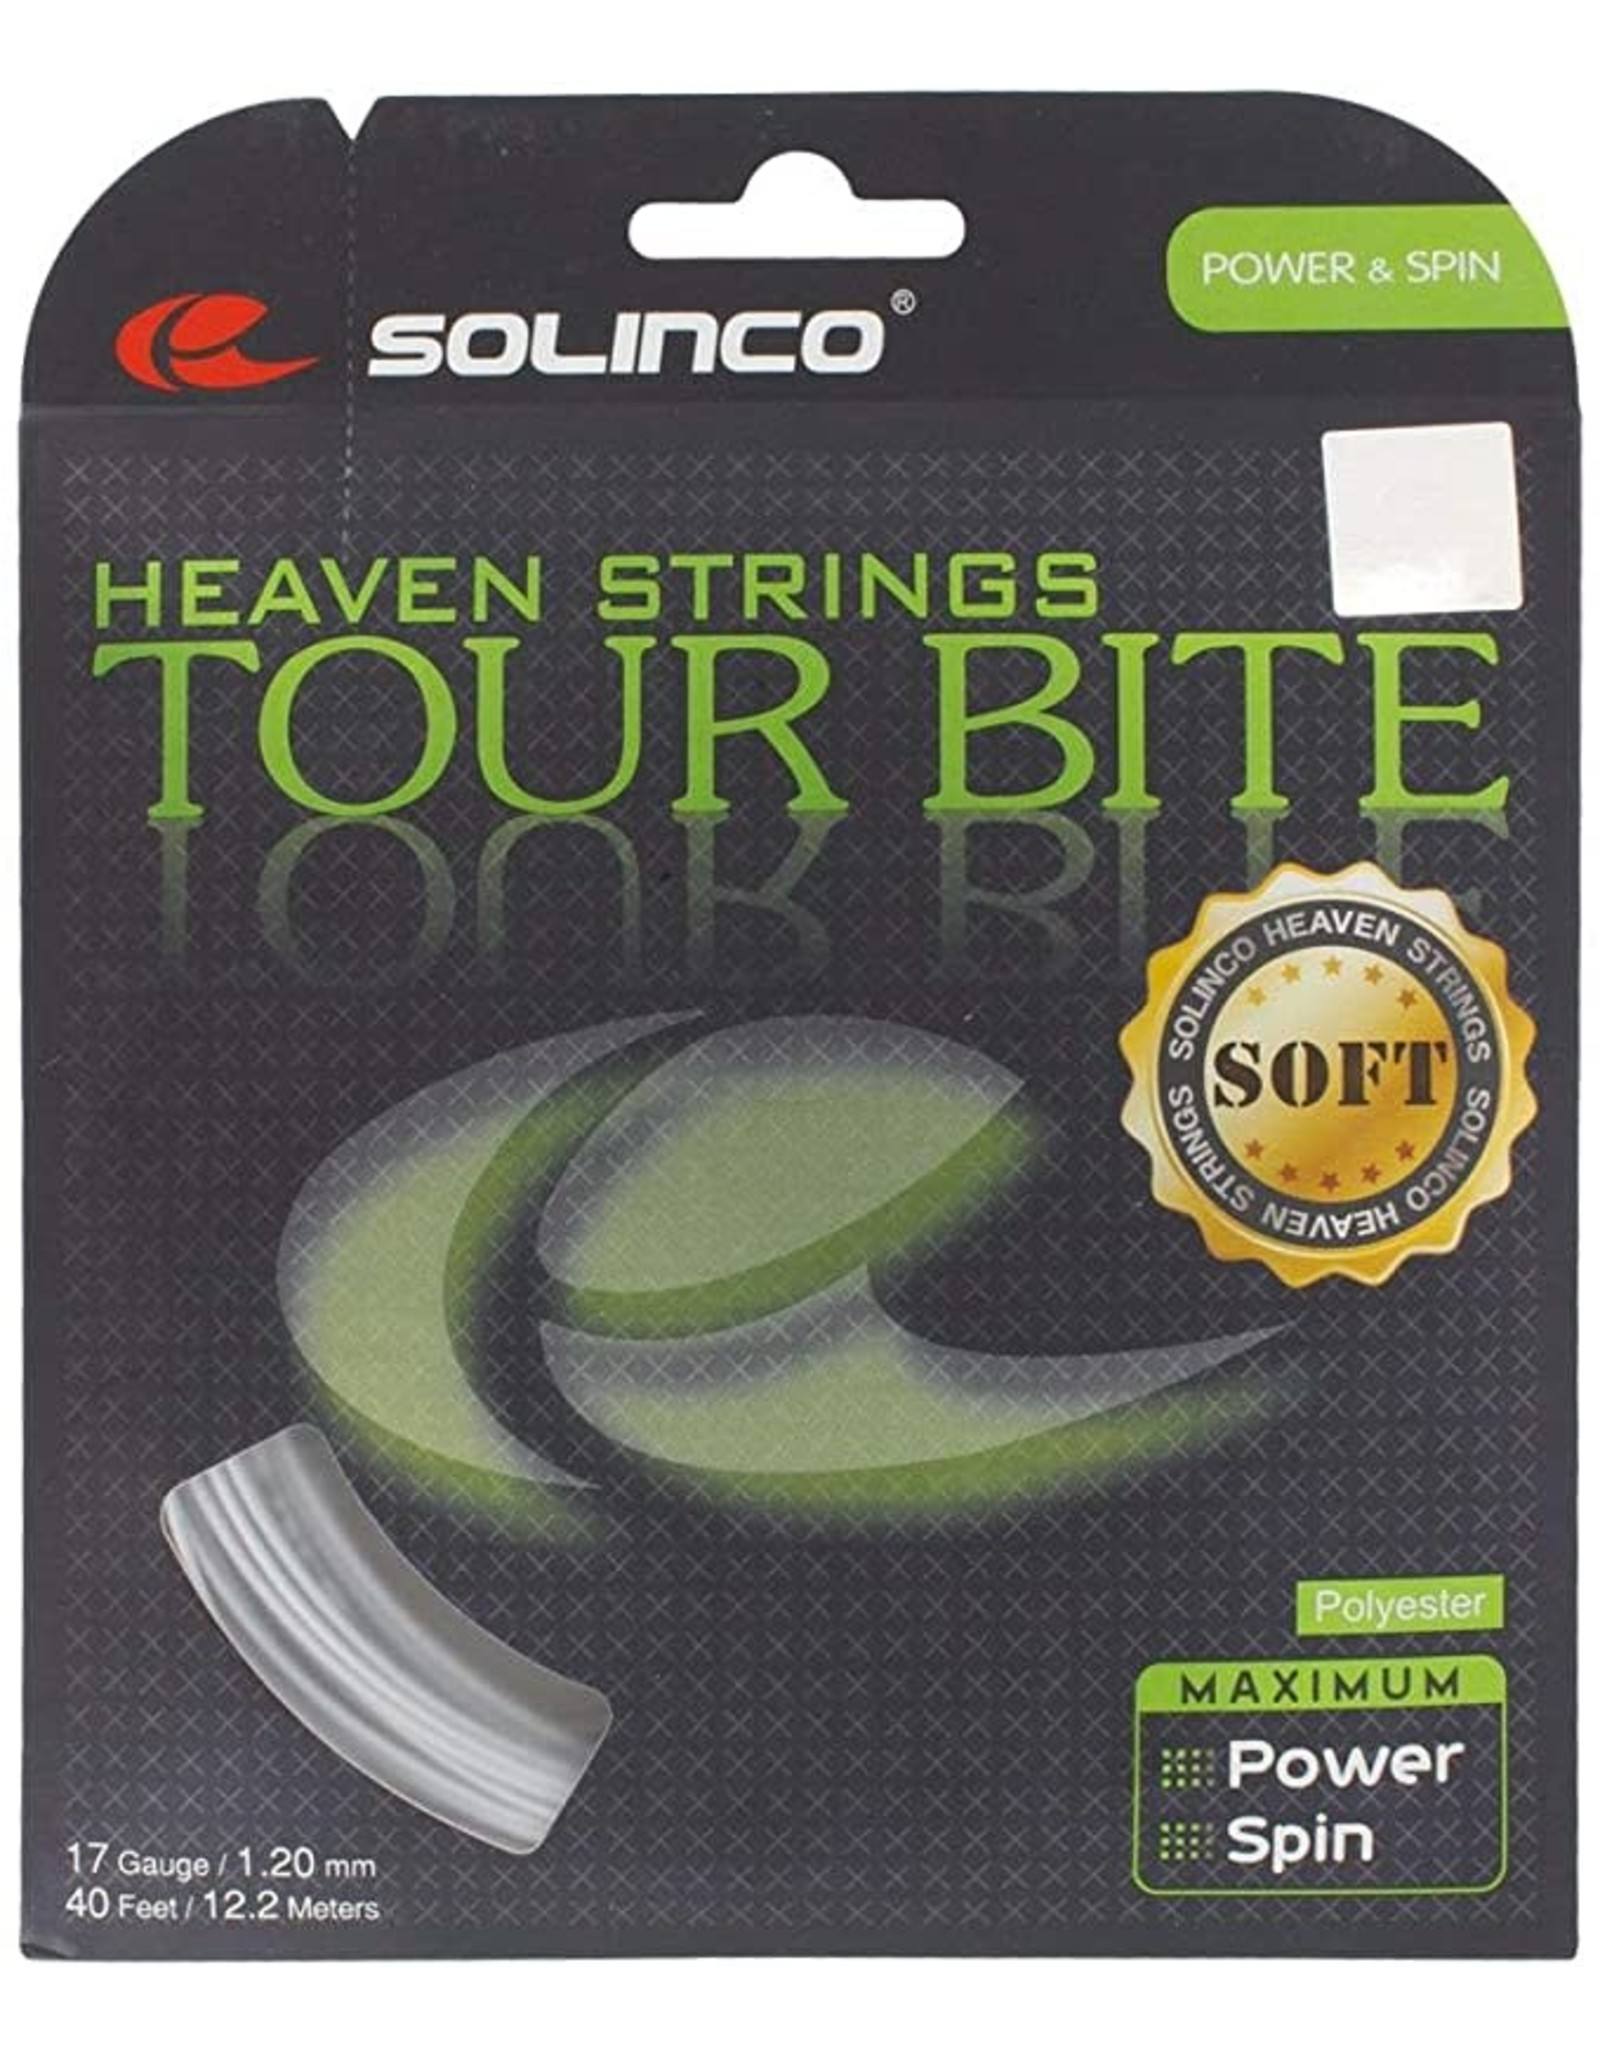 Solinco Solinco Tour Bite SOFT String